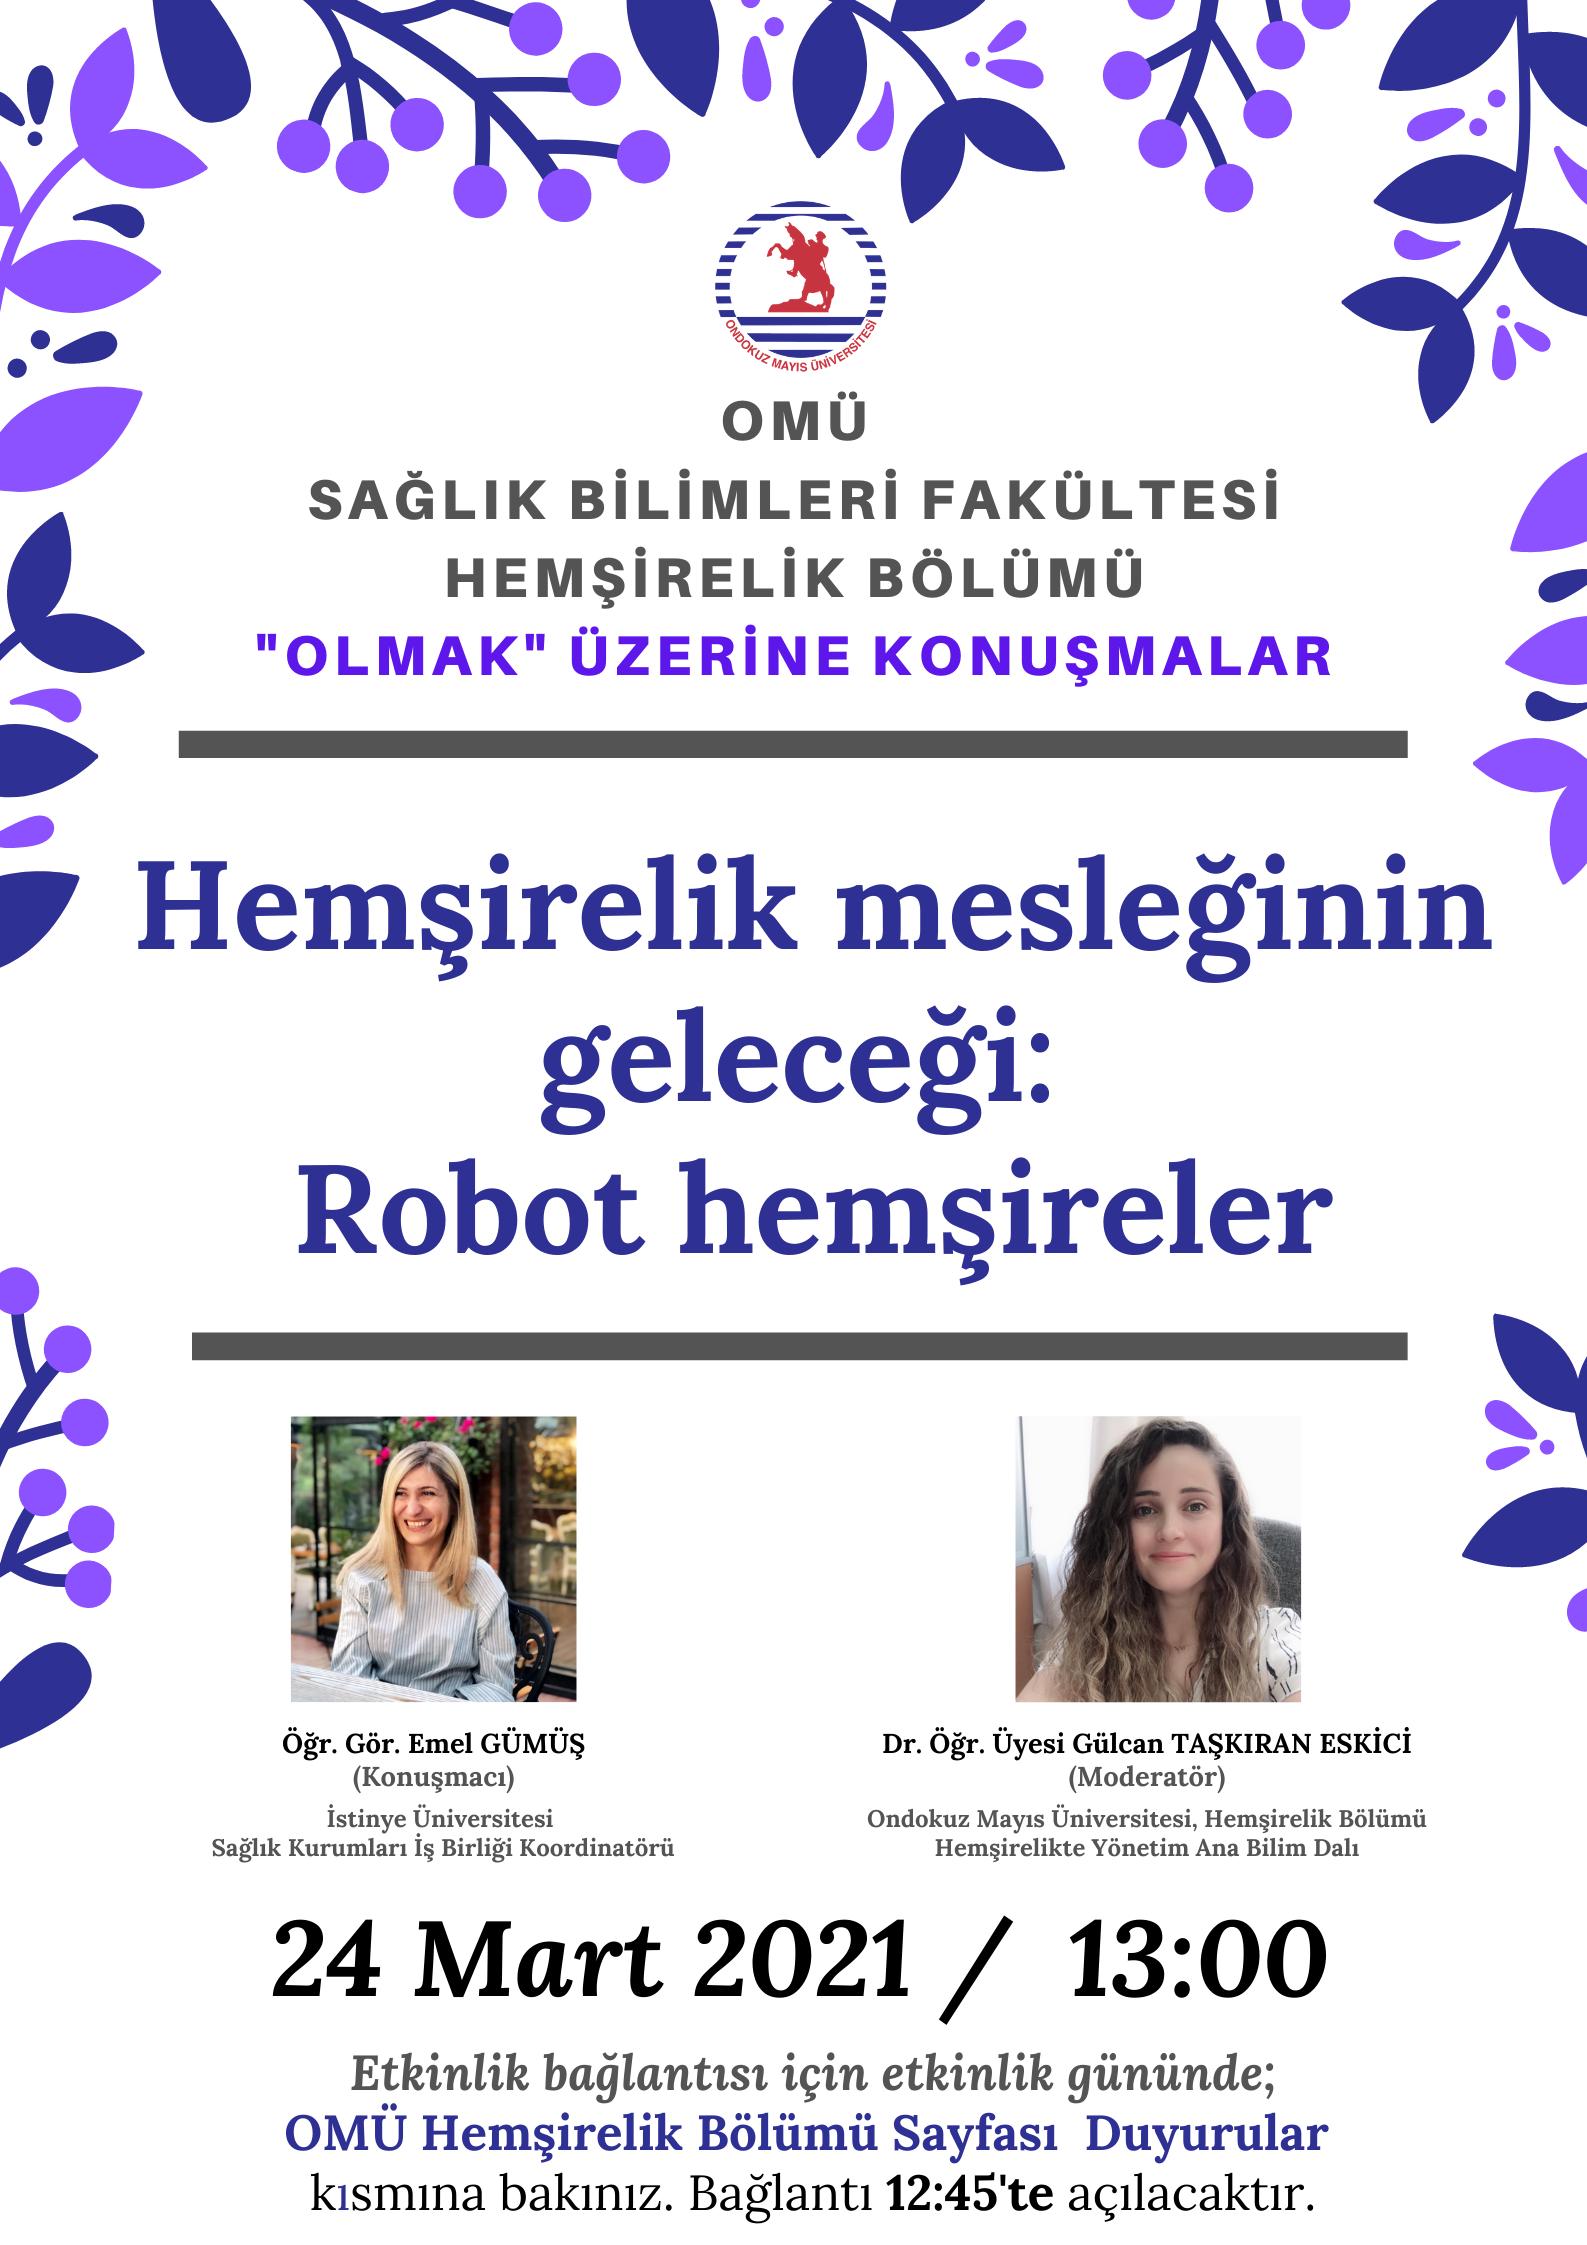 https://www.omu.edu.tr/sites/default/files/hemsirelik_mesleginin_gelecegi_robot_hemsireler.png